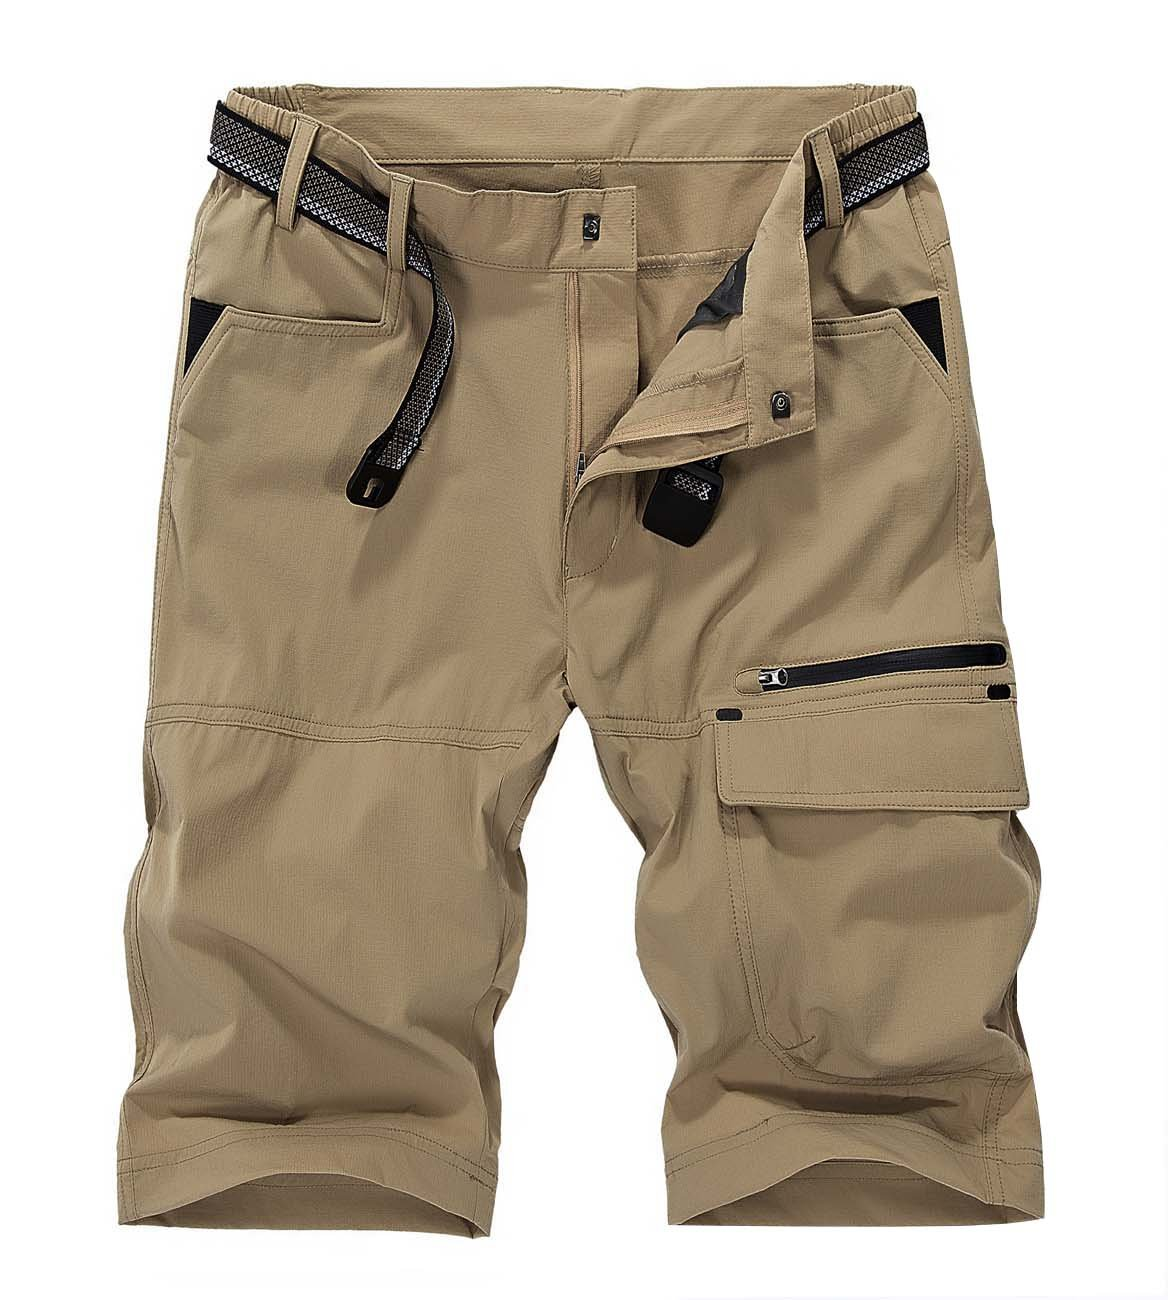 LASIUMIAT Men's Travel Cargo Short Lightweight Hiking Shorts Sports Casual Shorts Khaki